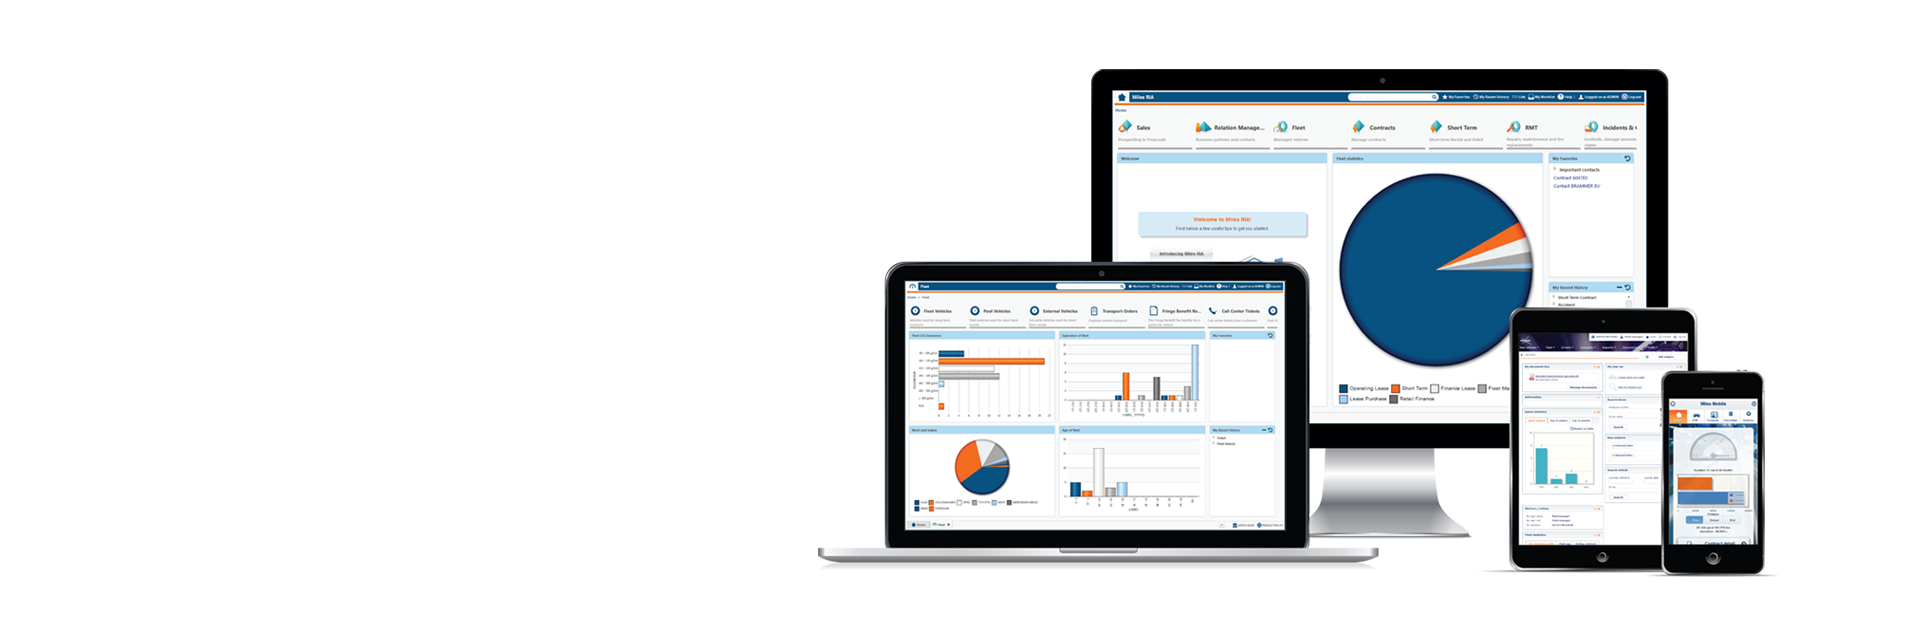 Miles 見積から売却までをオール・イン・ワンでサポートする オートリース業務専用ERPアプリケーション